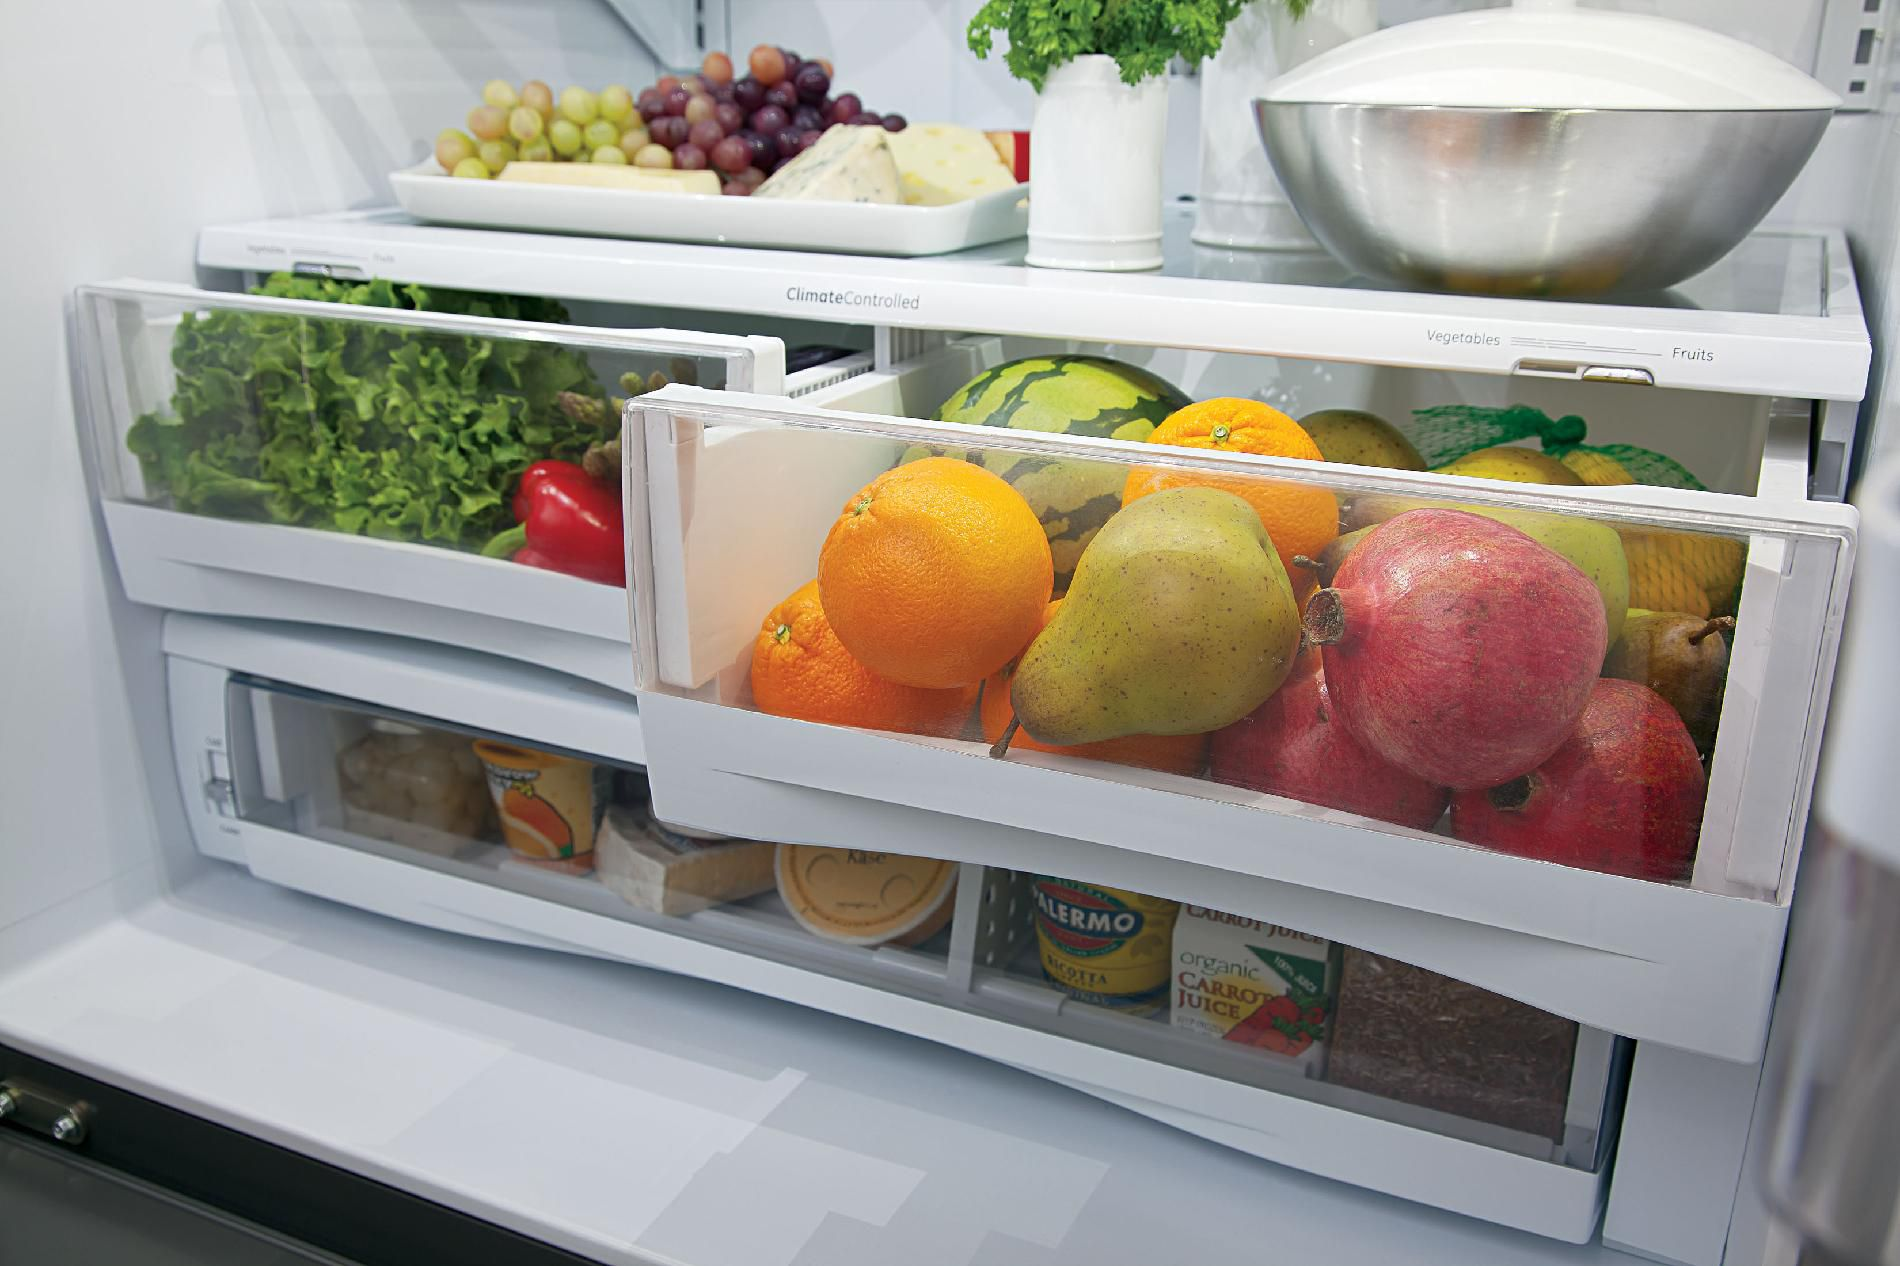 GE 26.3 cu. ft. French Door Refrigerator - Slate